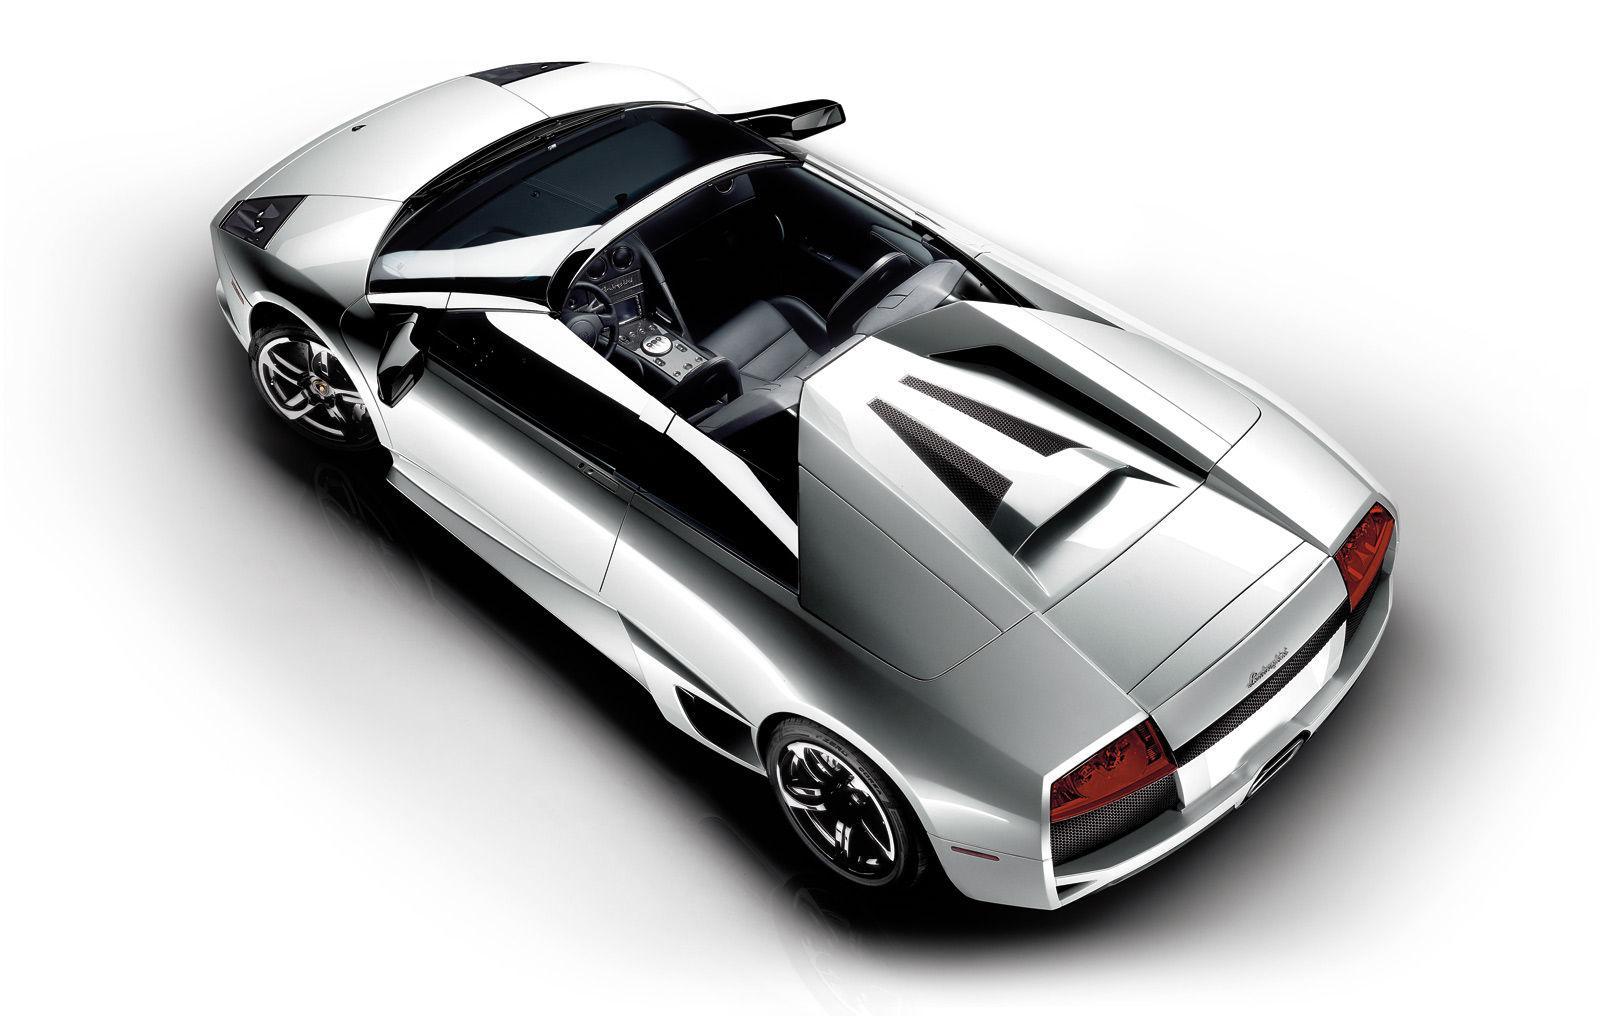 Lamborghini Murcielago LP 640 Roadster